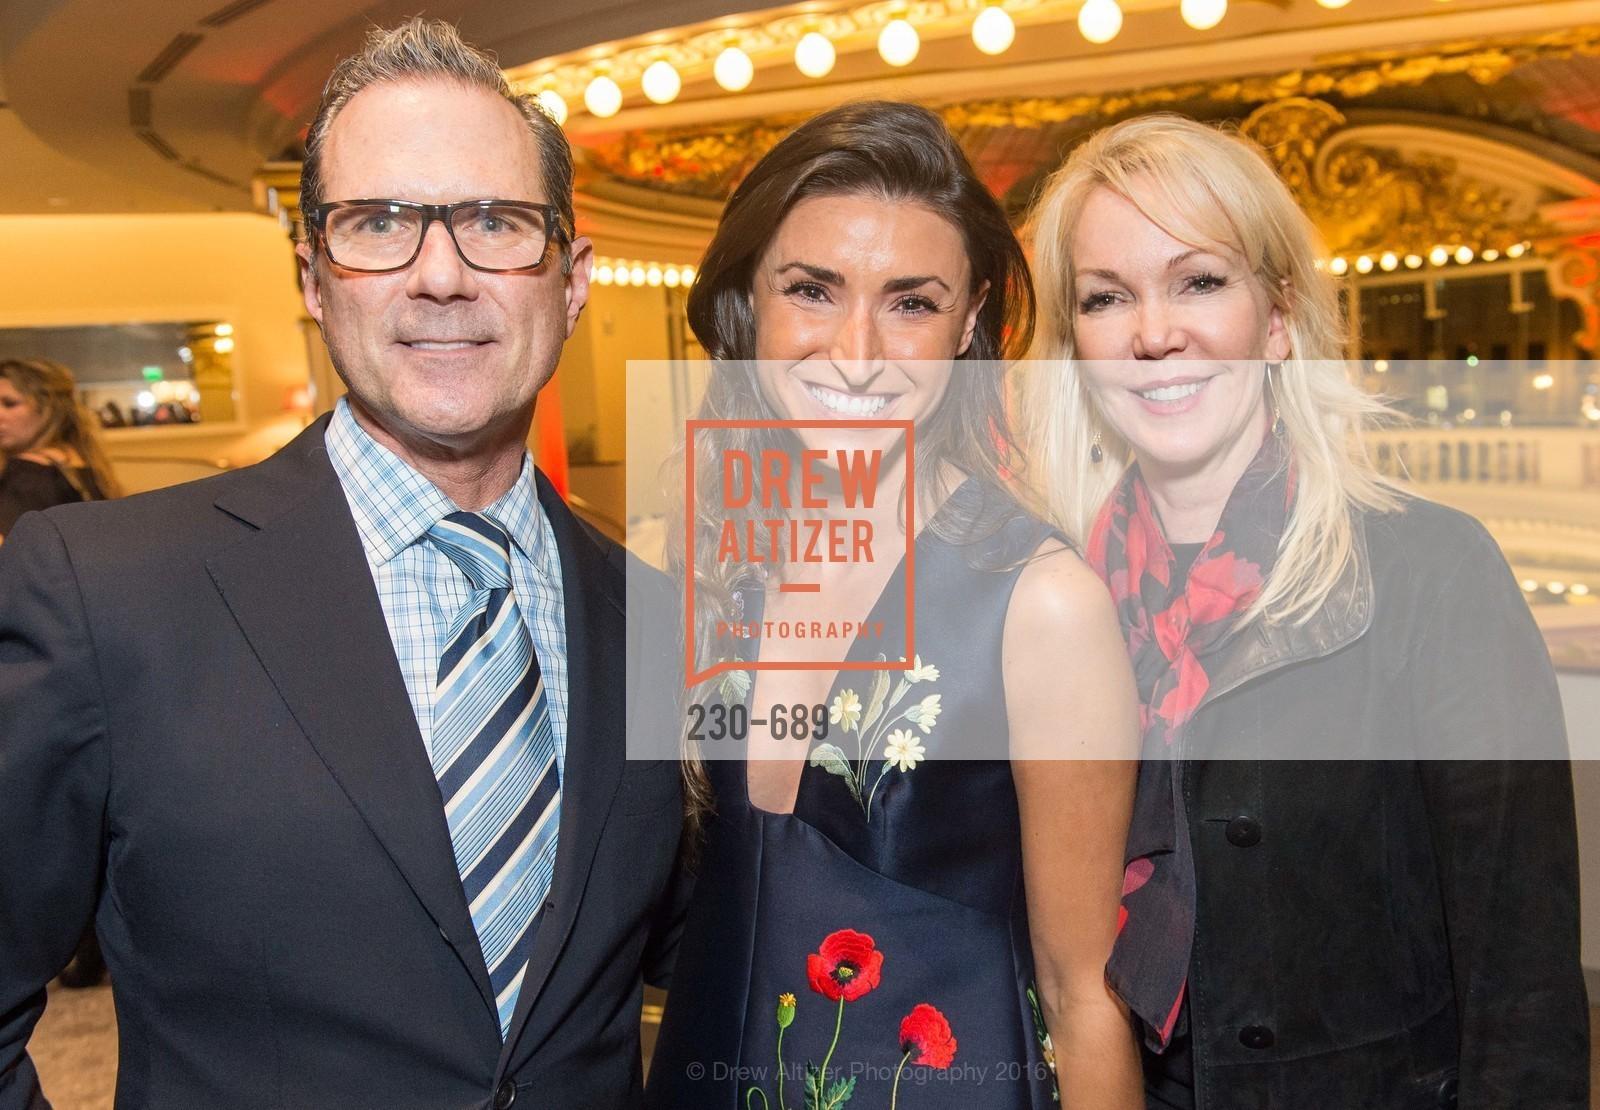 Bron Wyn, Mary Christensen, Oscar de la Renta Cocktail Party with Boaz Mazor, The Rotunda Restaurant, January 19th, 2016